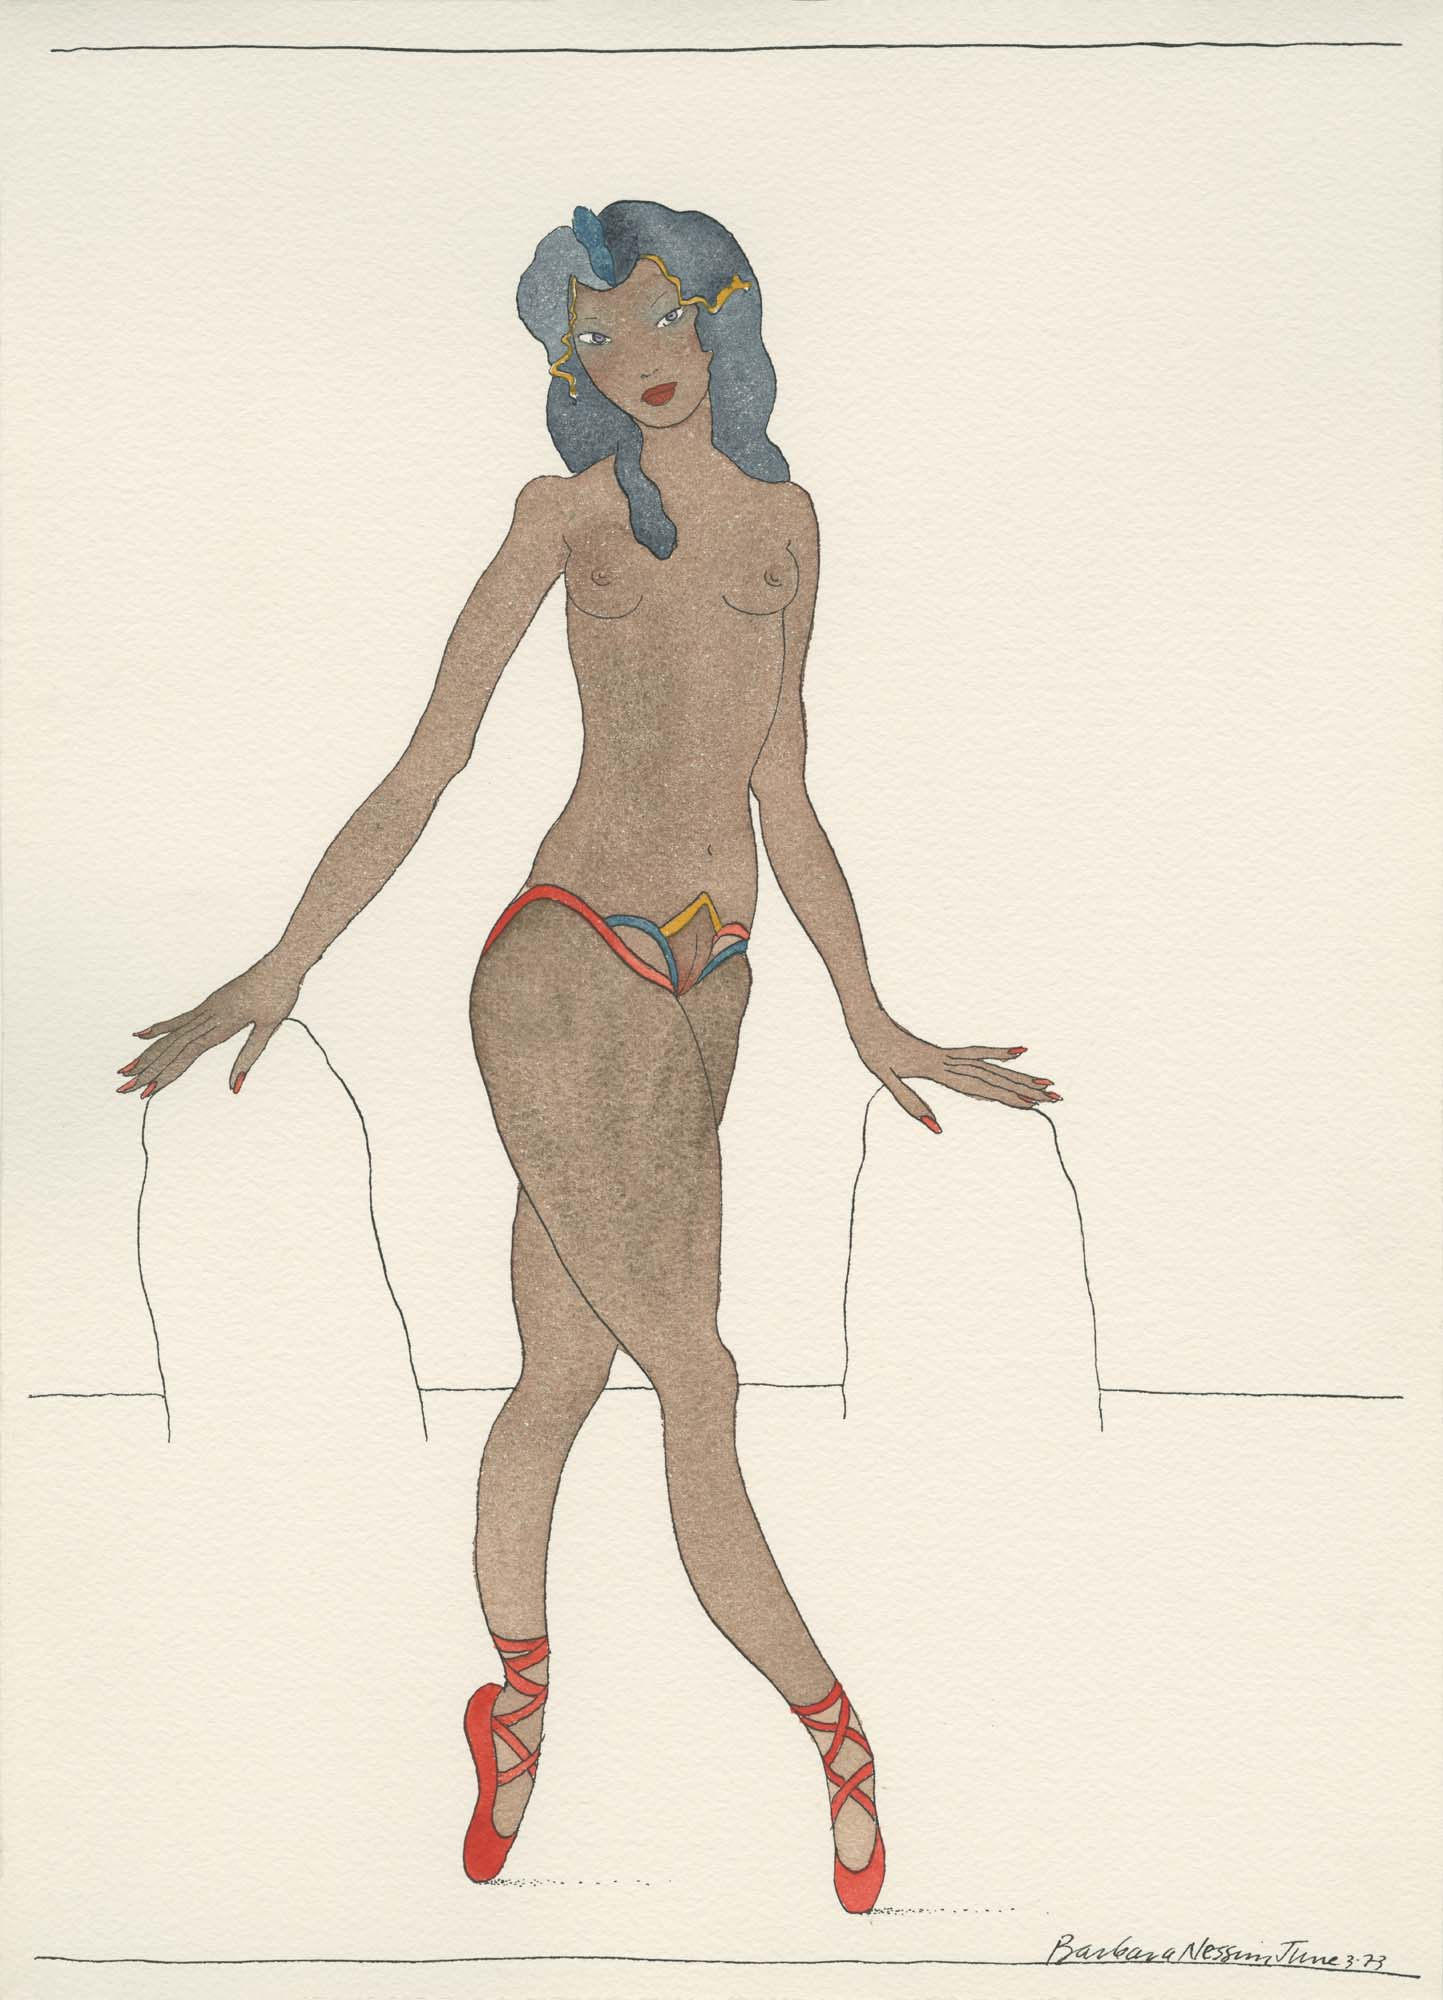 <I>Yvonne with Rainbow Panties</I>, 1973